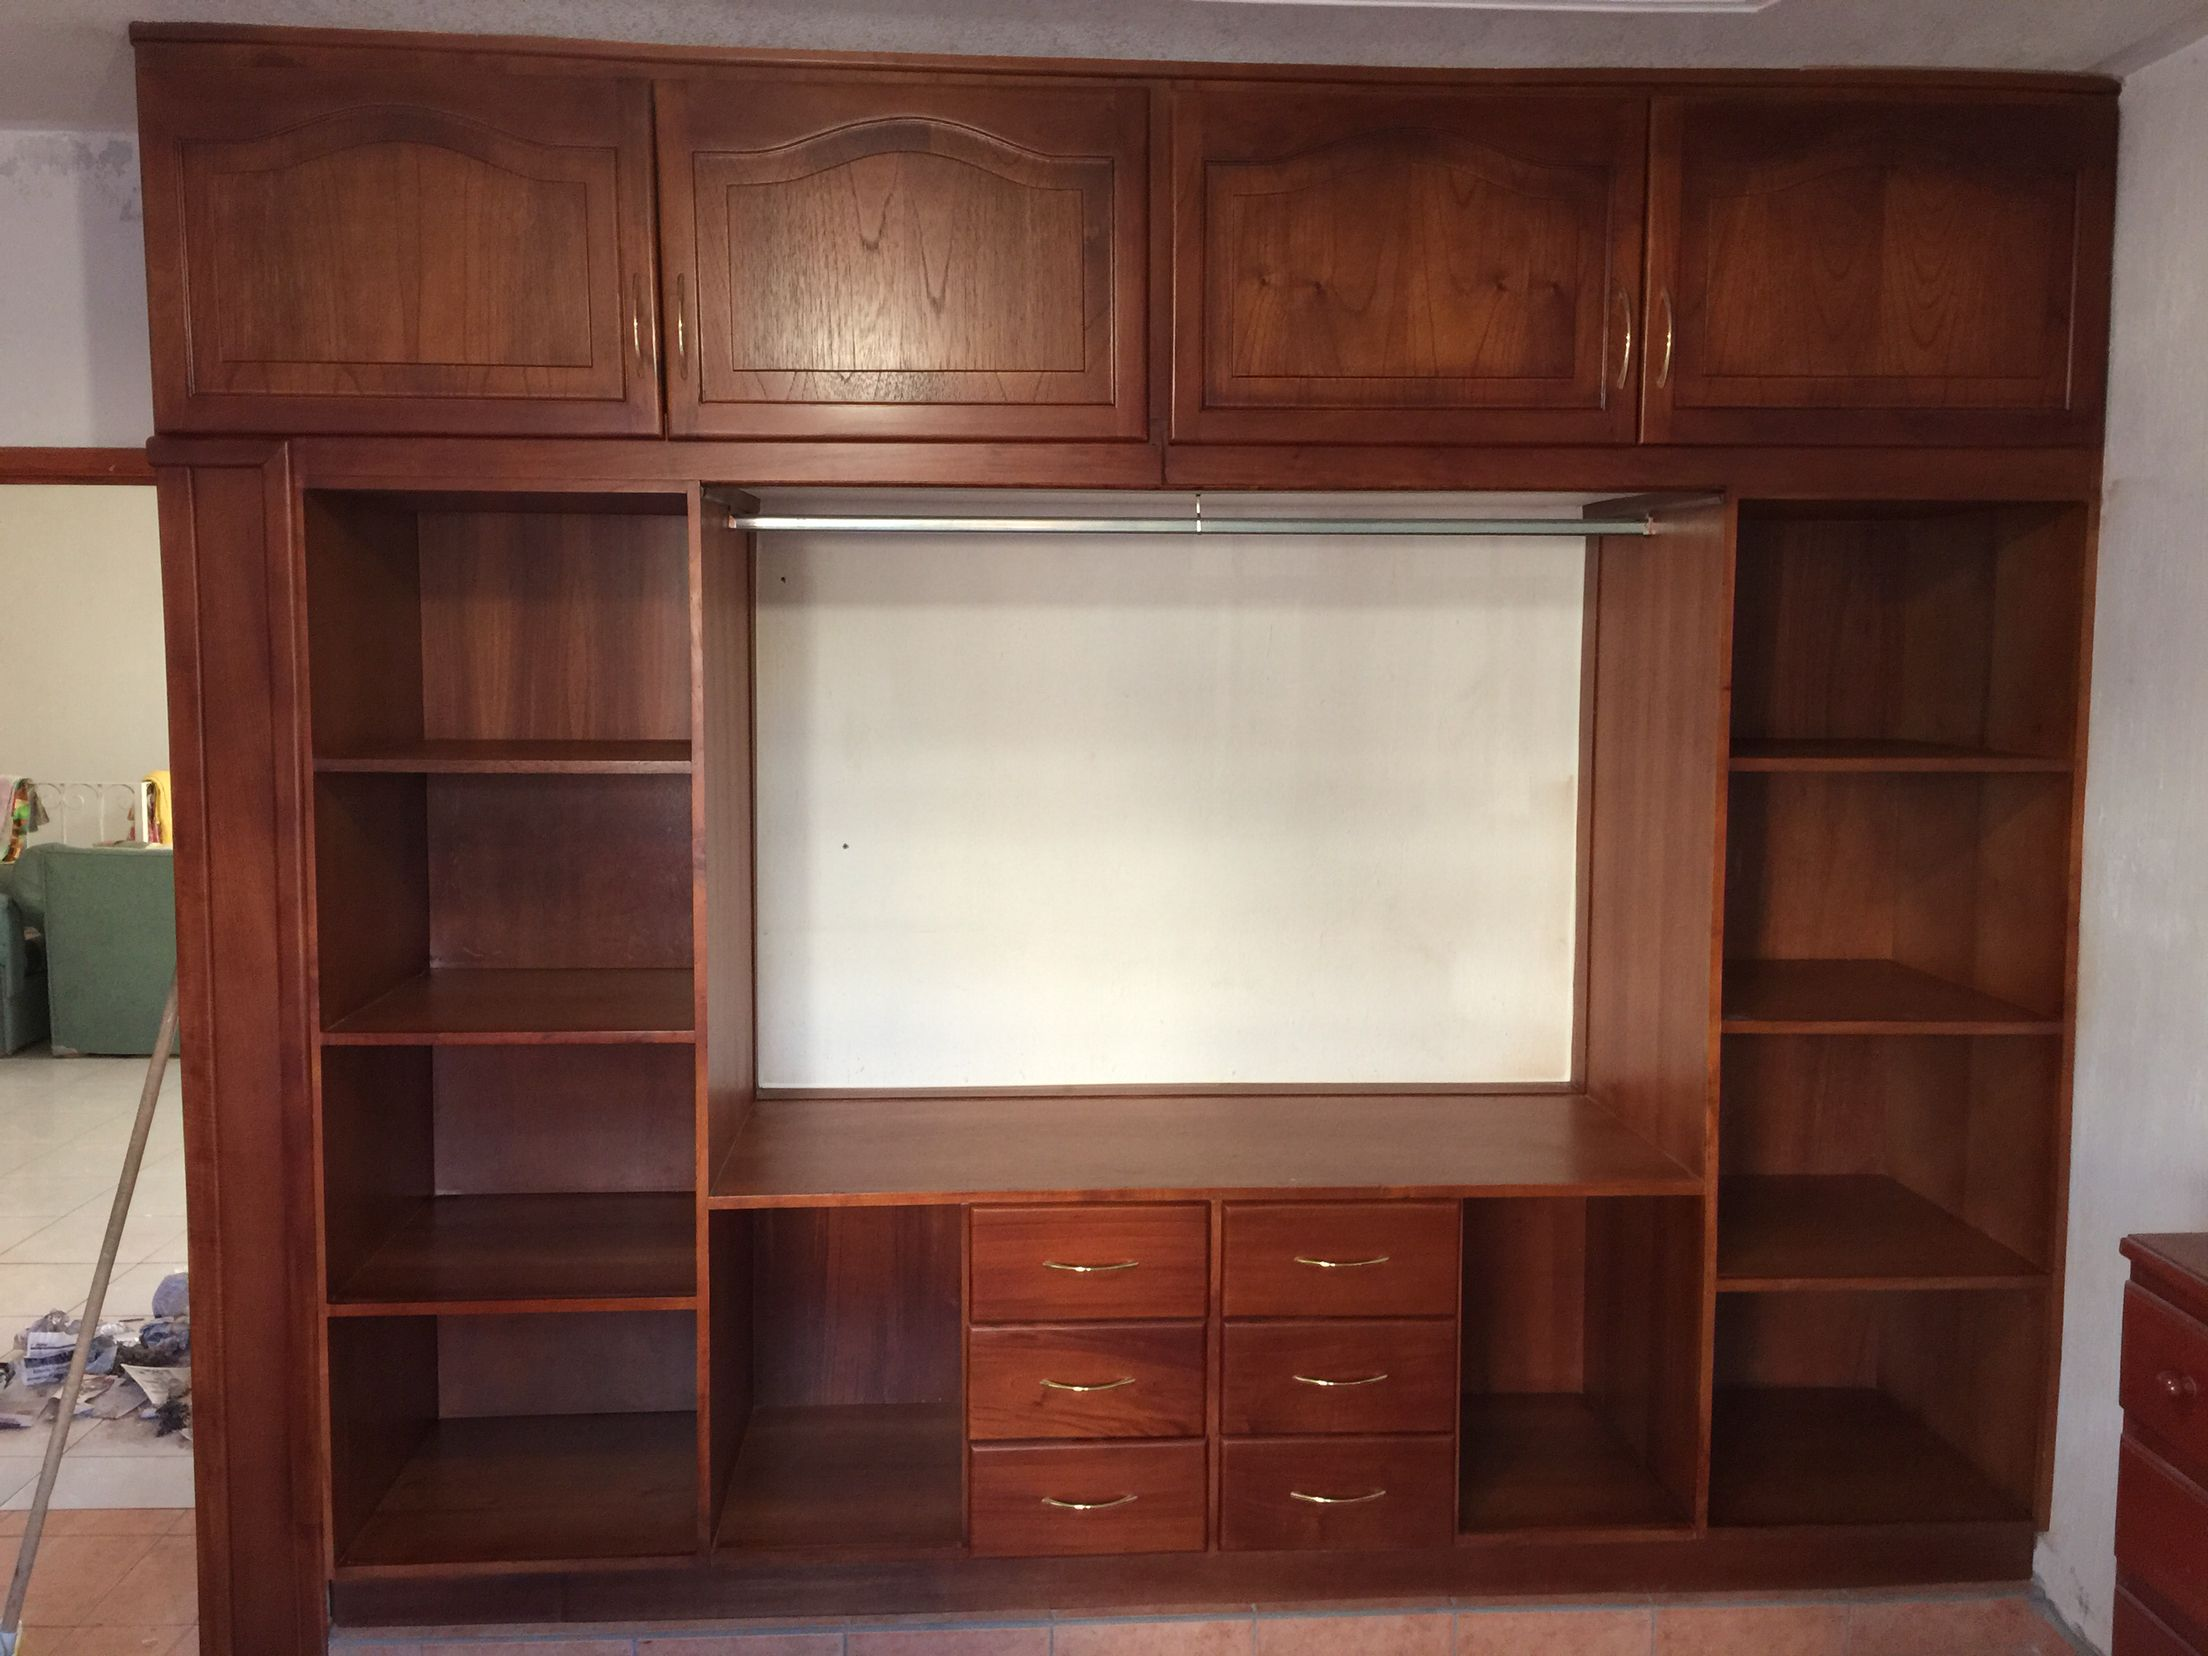 Cl set en madera de cedro puertas langarica pinterest for Closet en madera